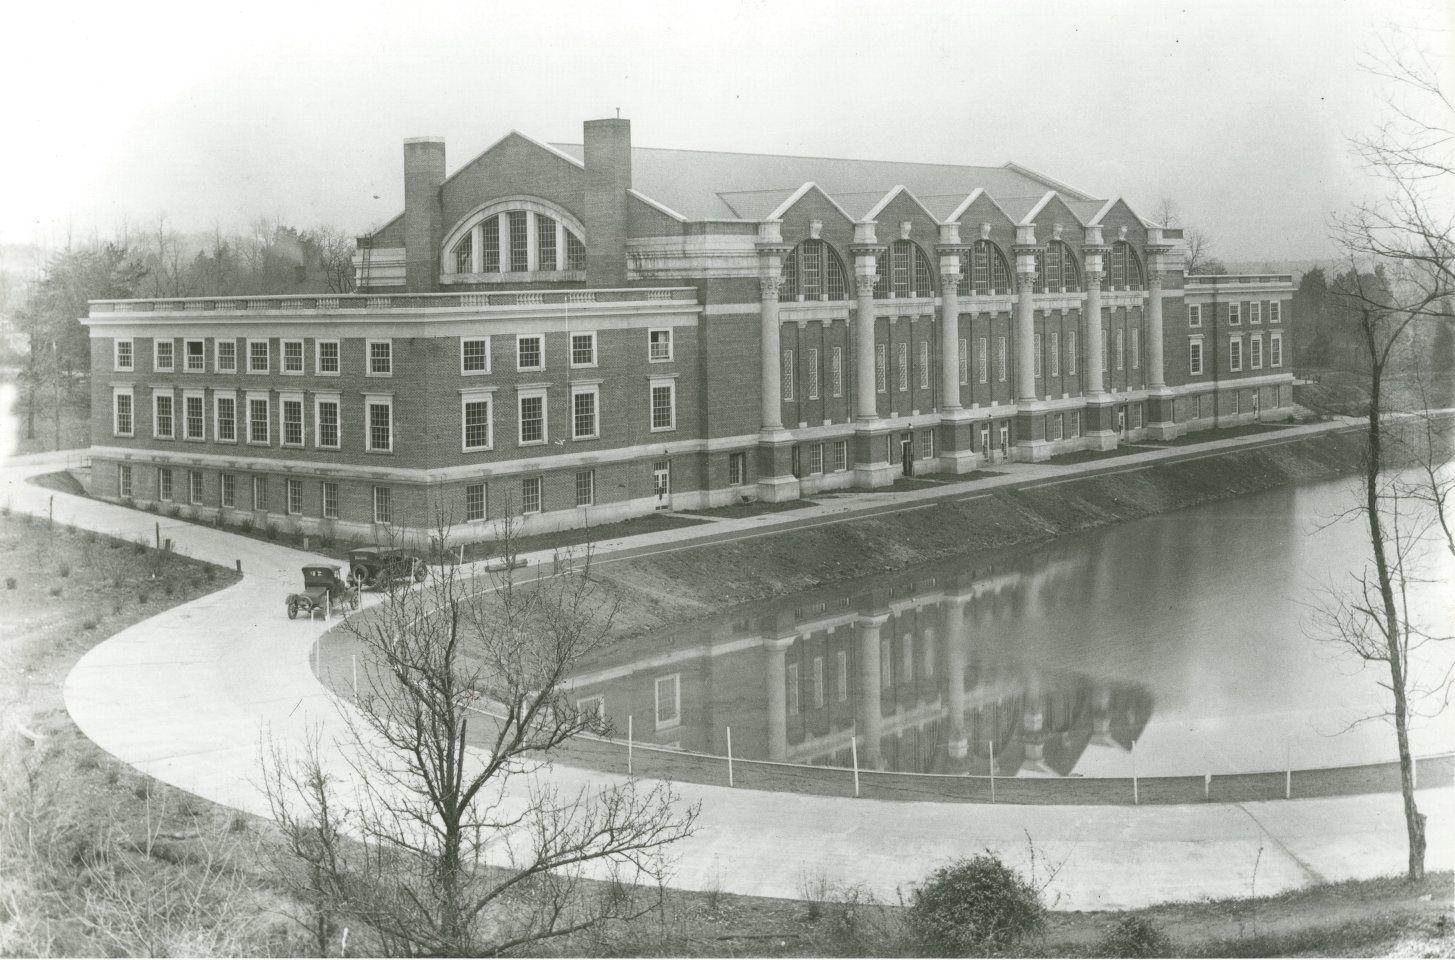 Memorial Gymnasium from University of Virginia Visual